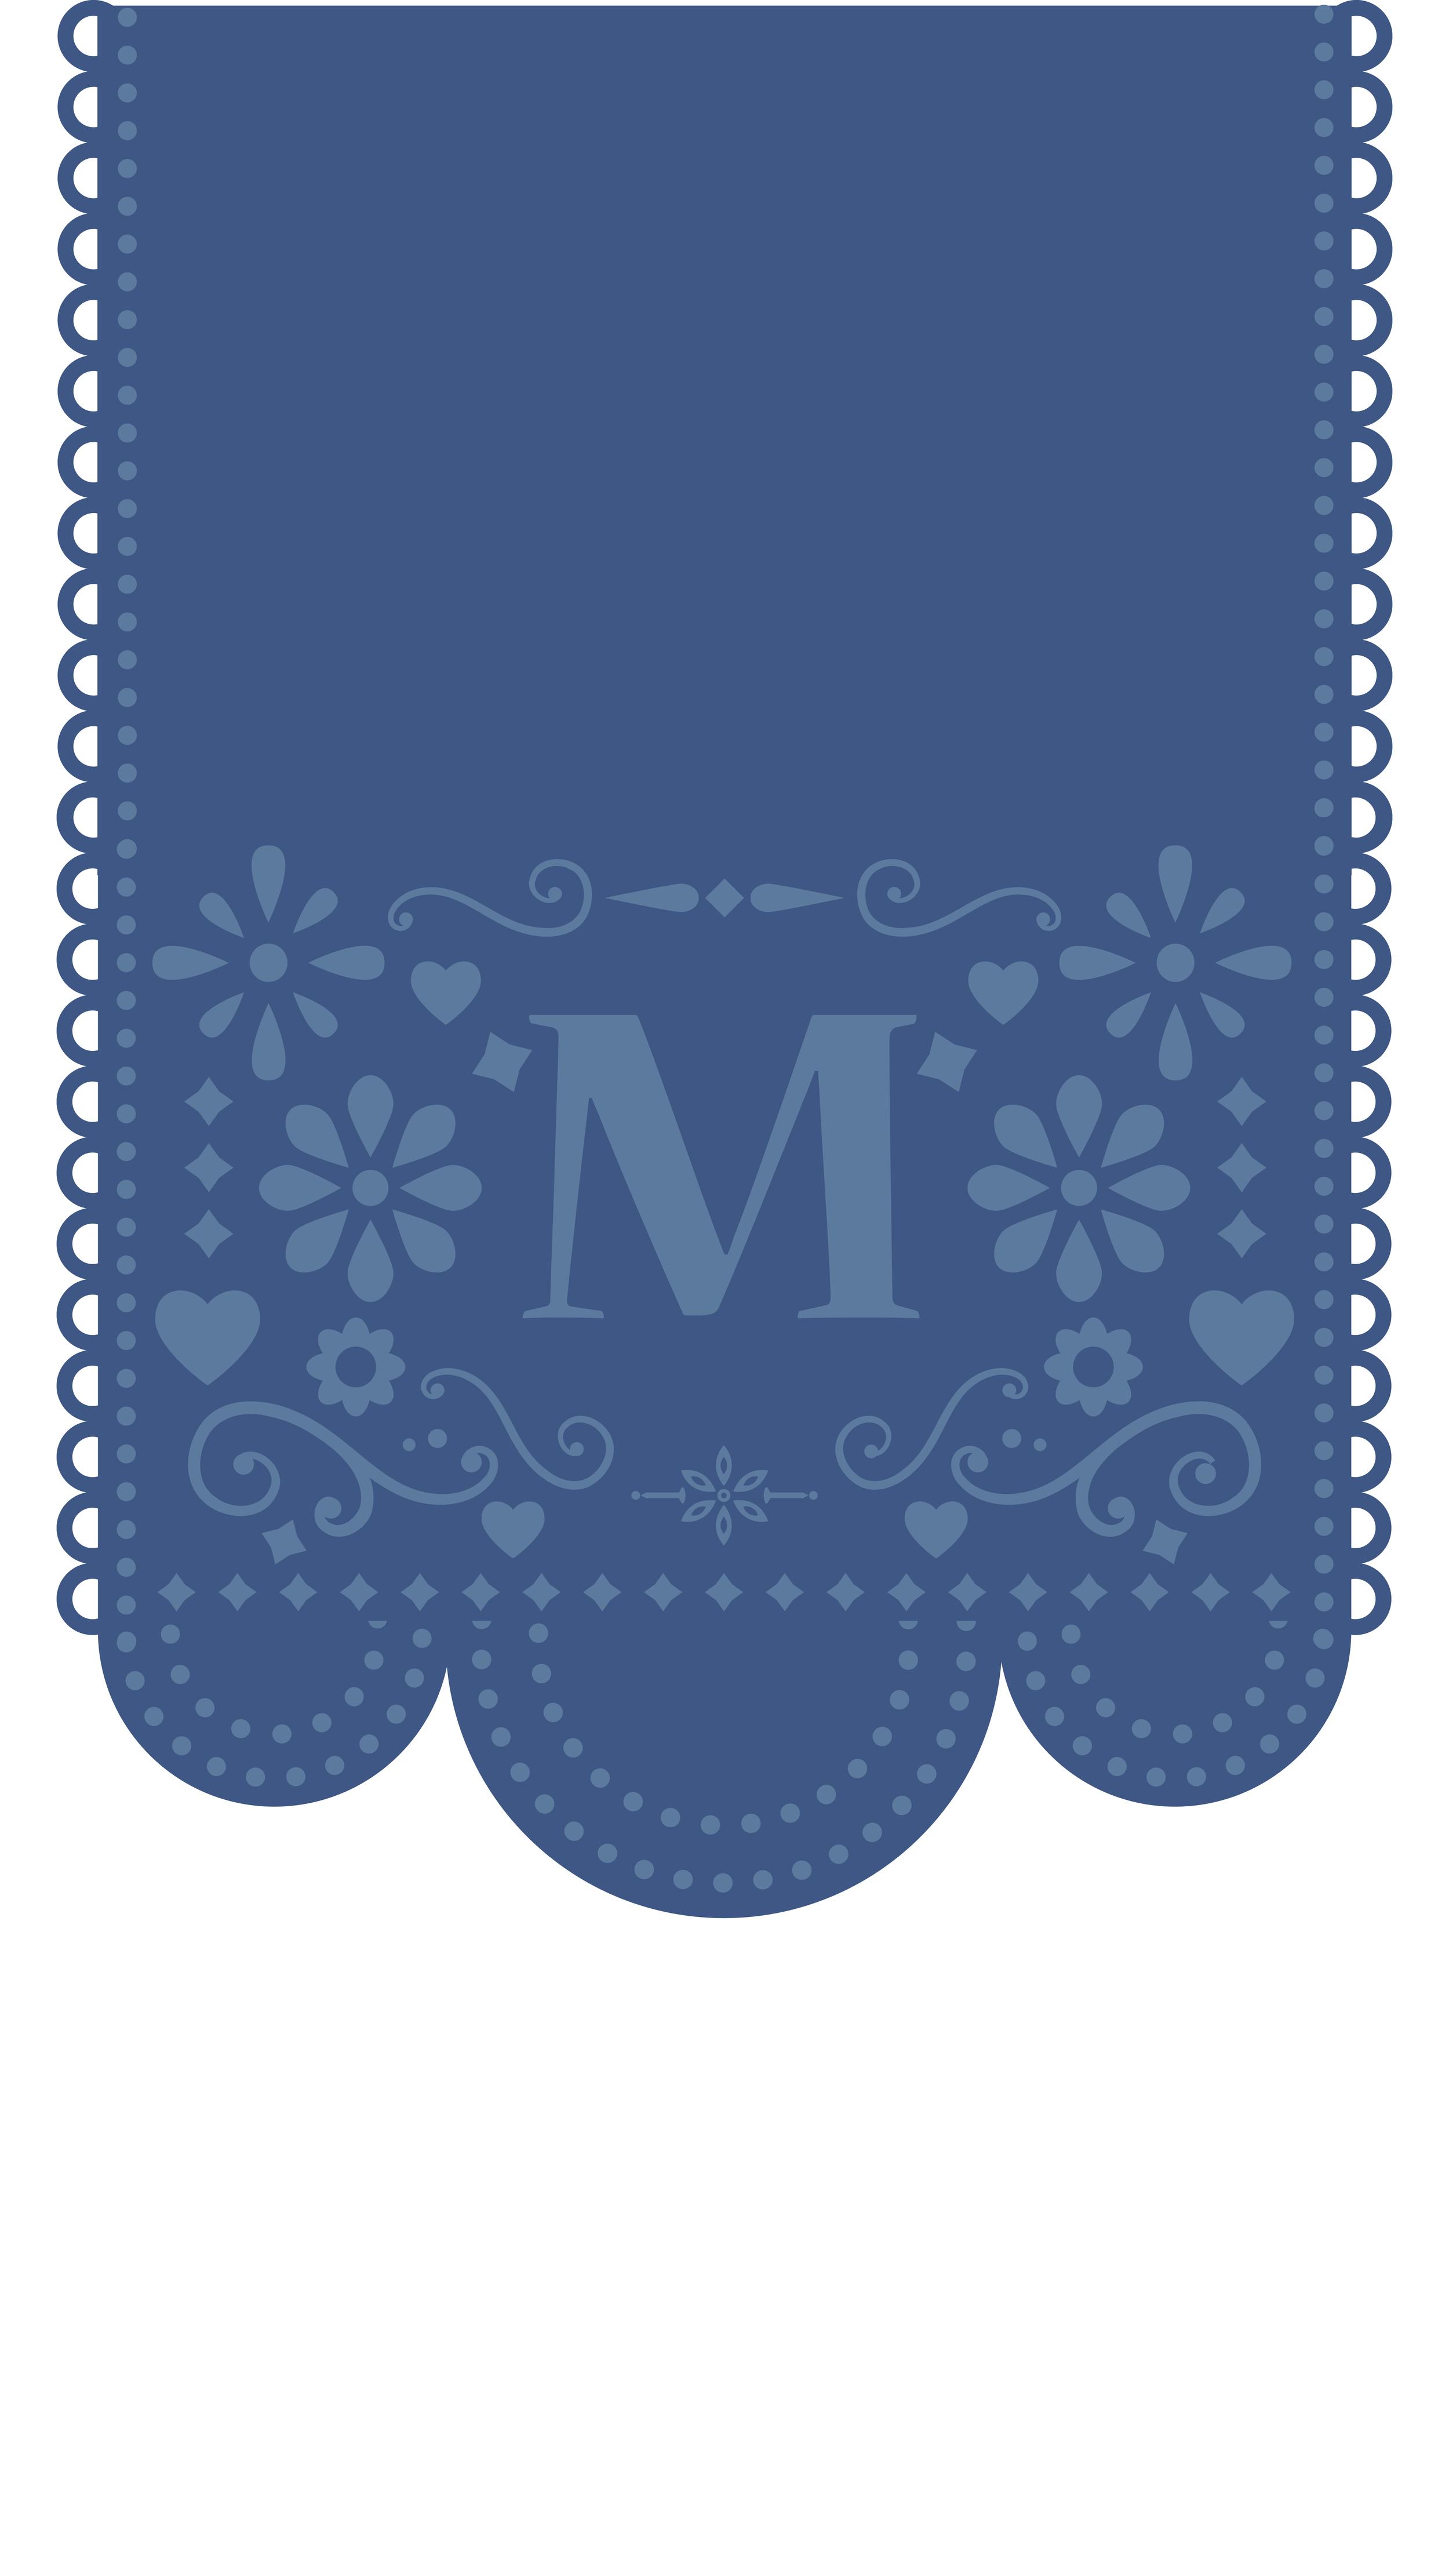 m-fiesta-banner.png